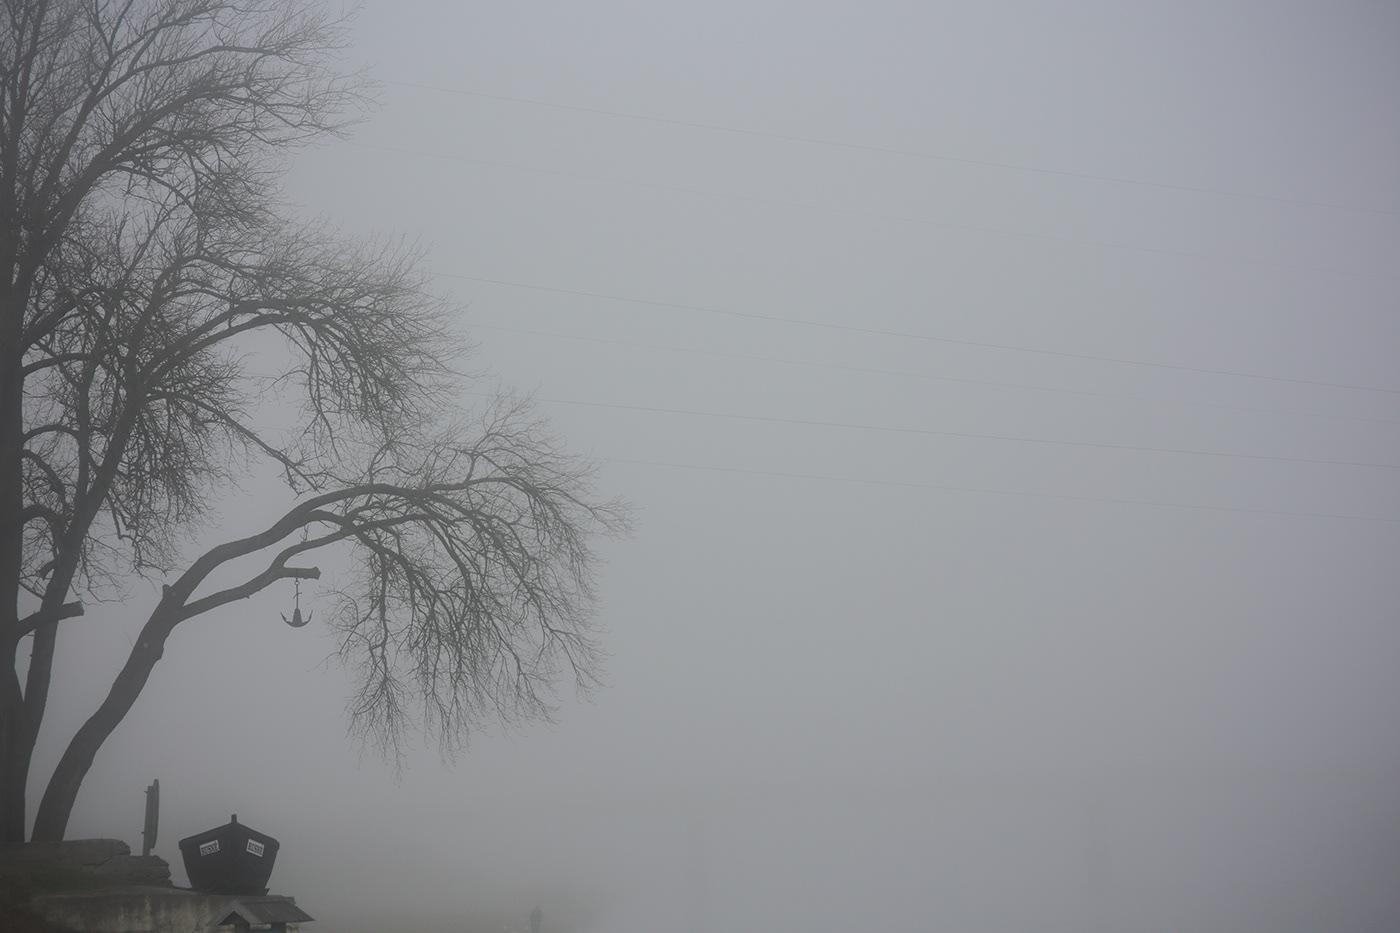 fog Fog Photography Landscape lietuva lithuania Mindaugas Buivydas mist tree art winter